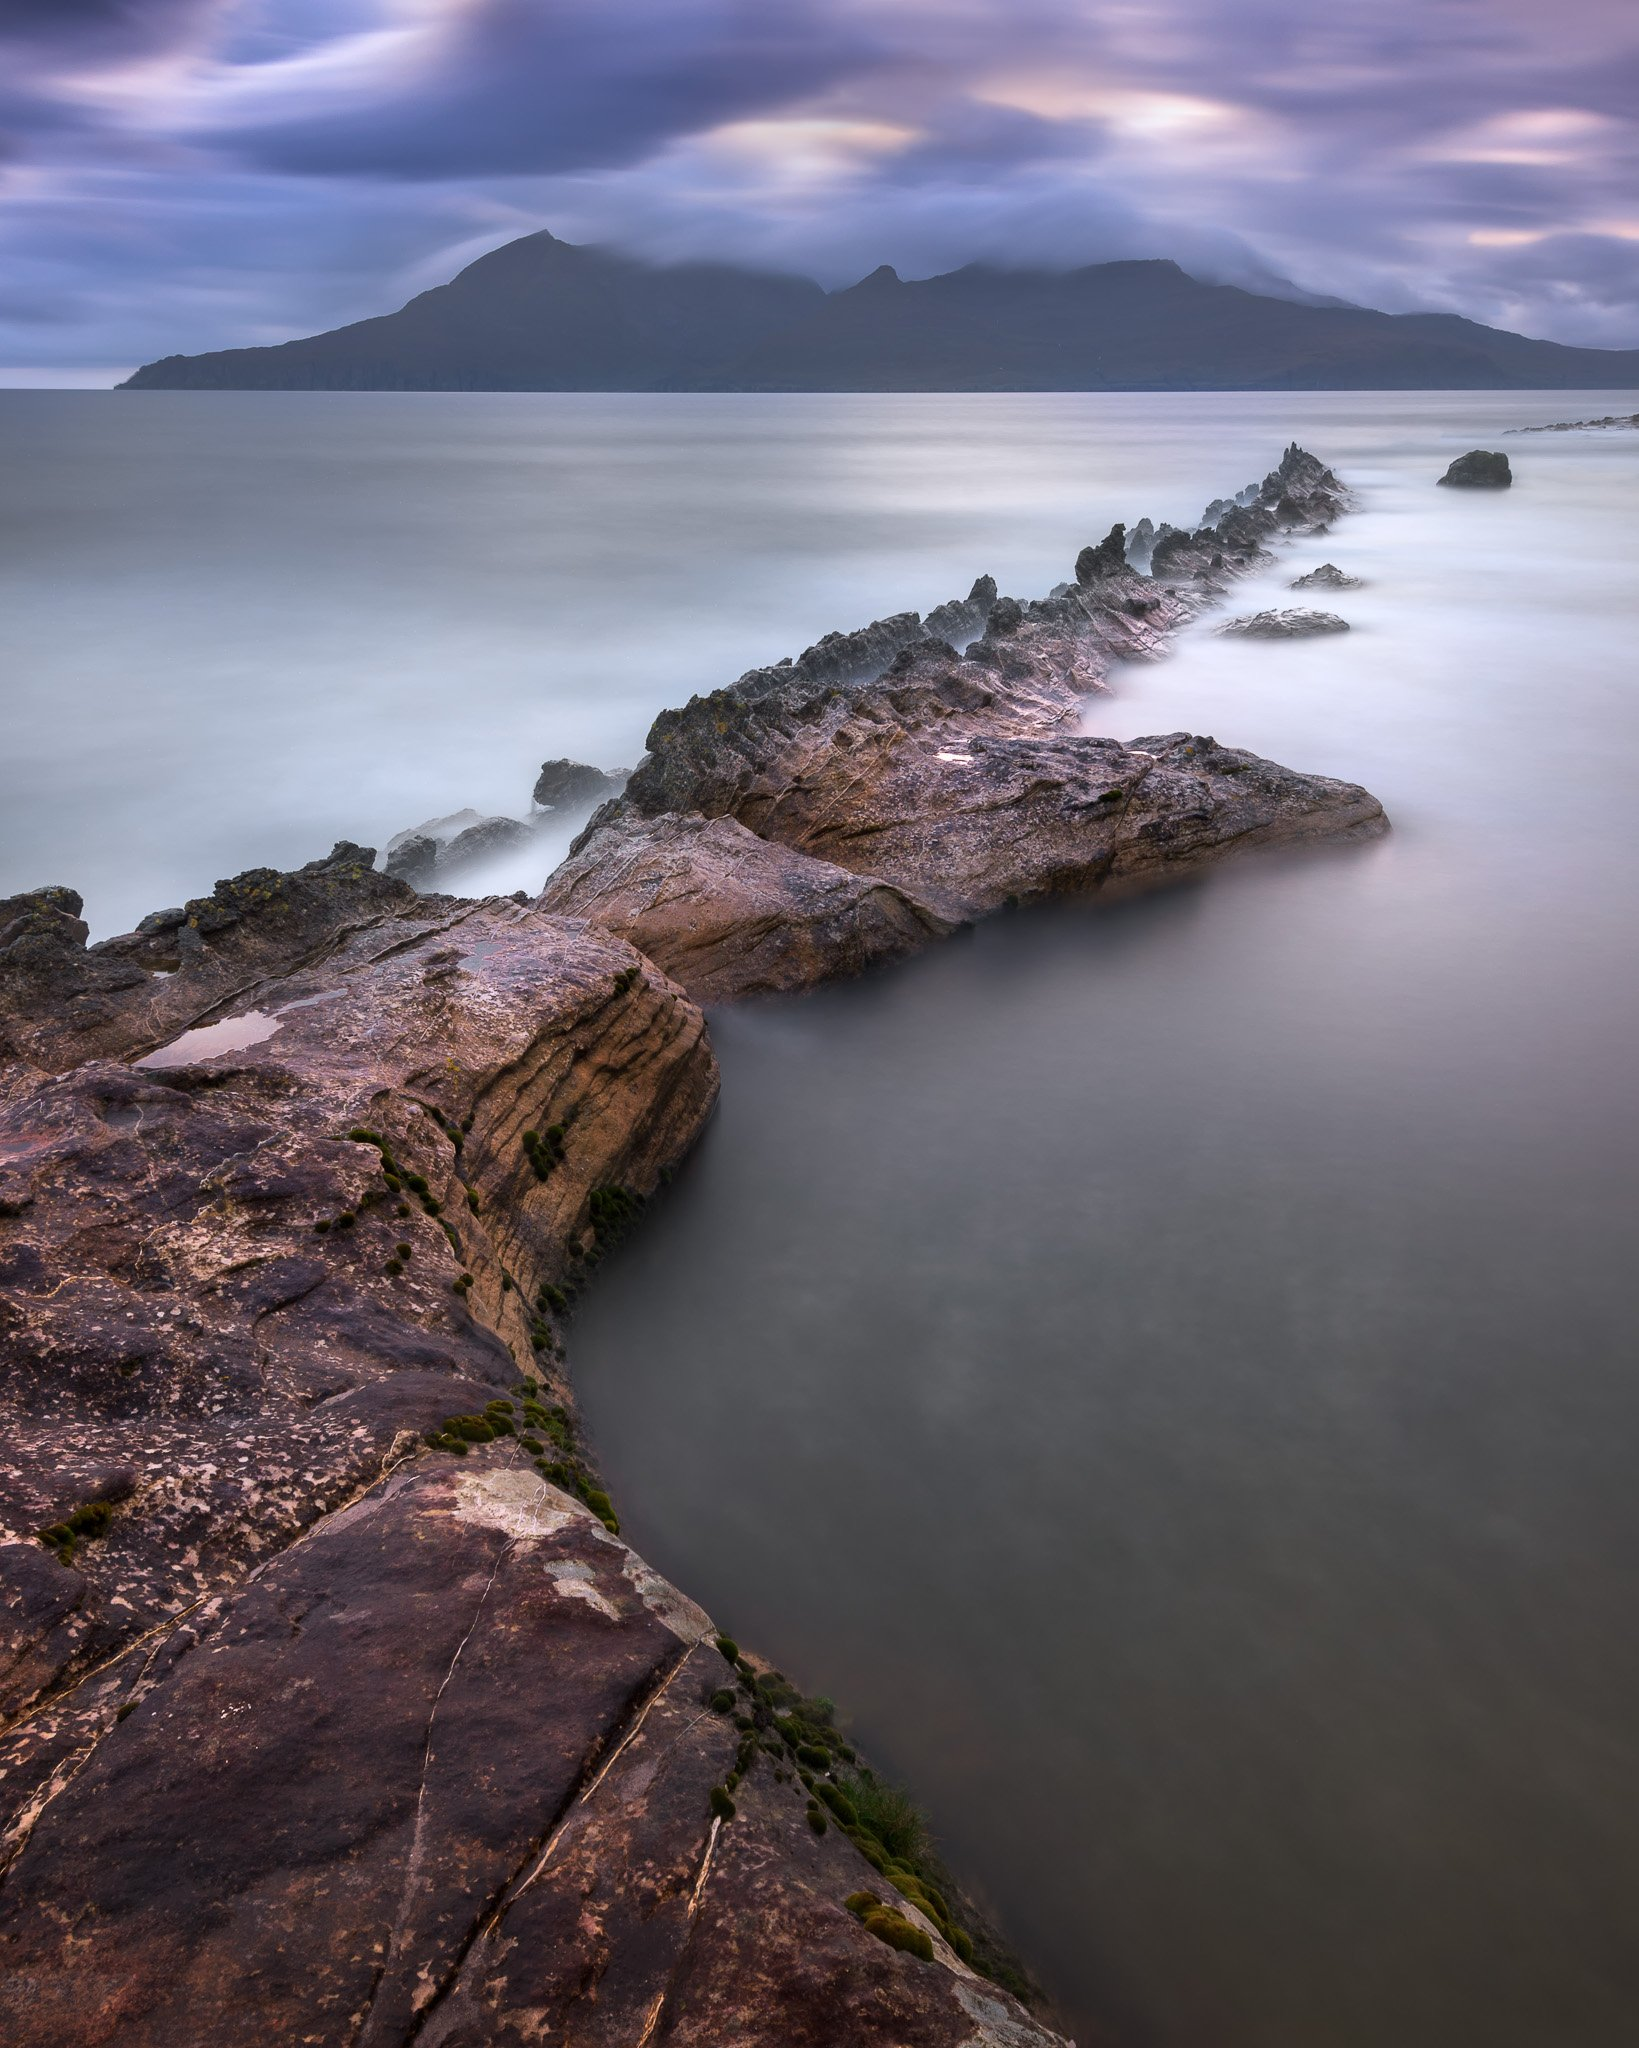 bay, beach, beautiful, blue, cliff, clouds, coast, coastal, dusk, eigg, europe, evening, golden, highlands, island, isle, kingdom, landscape, lochaber, nature, ocean, overcast, pebbles, rain, rainy, rhum, rock, rocky, rum, scenic, scotland, scottish, sea,, anshar